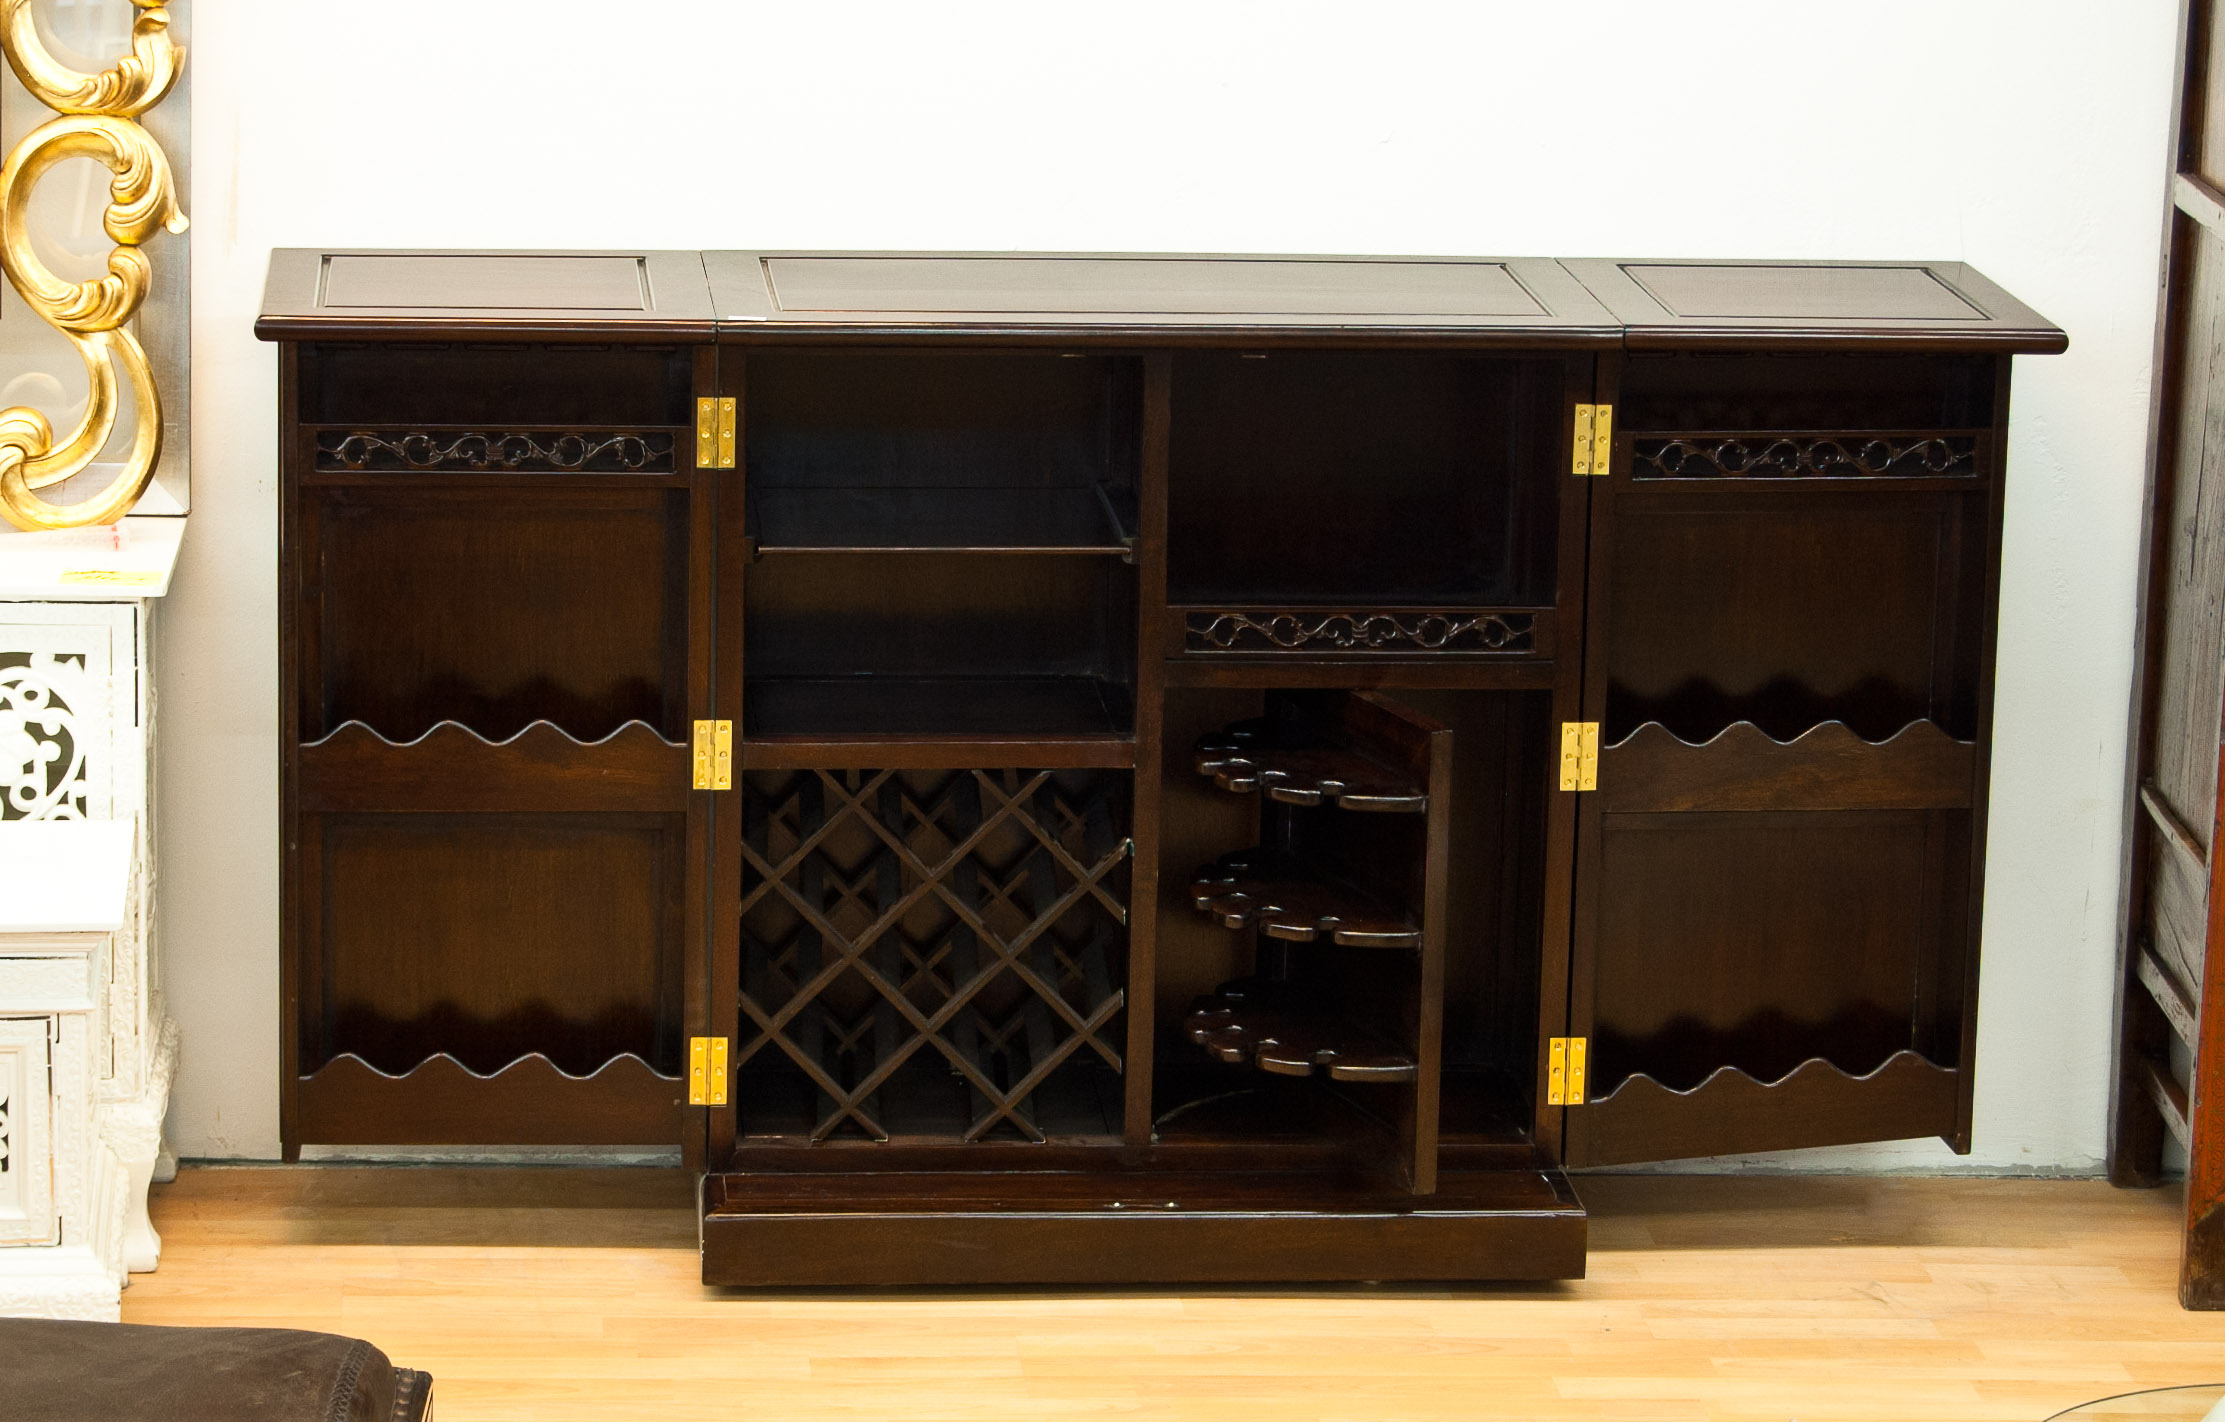 barschrank braun 12 5 2 16 schwarzer elefant. Black Bedroom Furniture Sets. Home Design Ideas